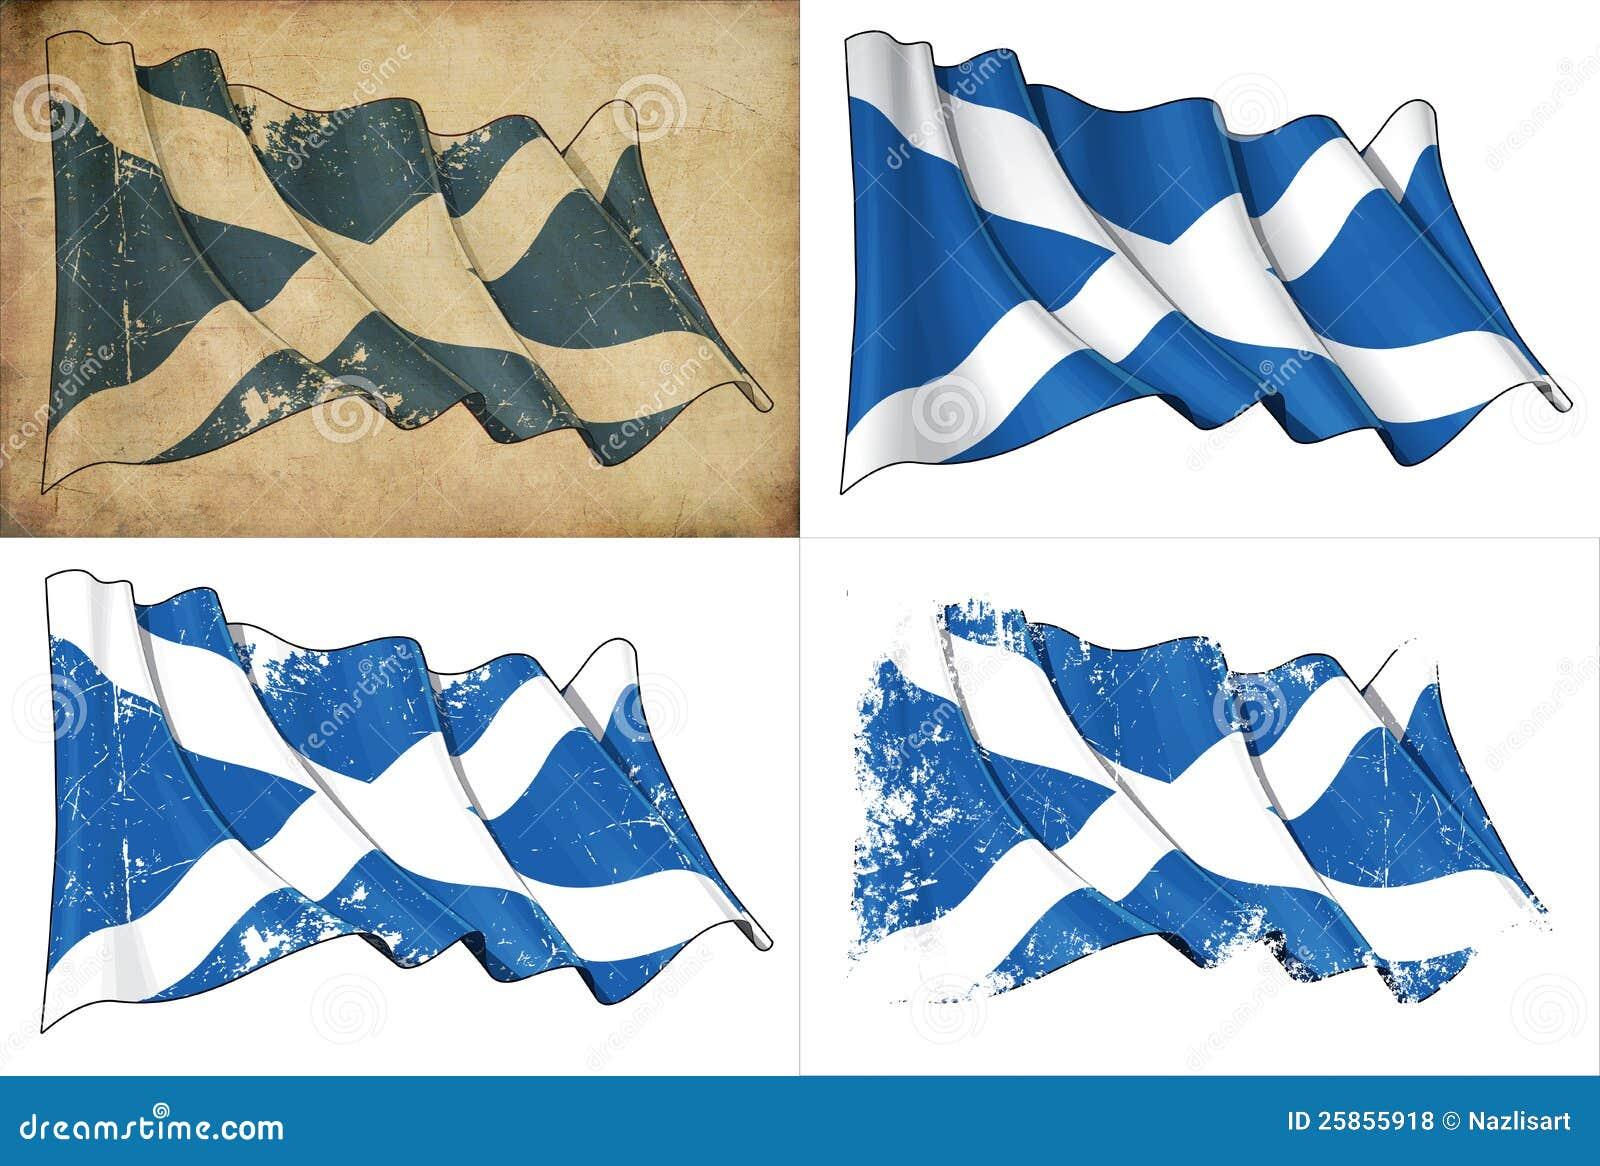 world flags collage stock illustration image 39405070